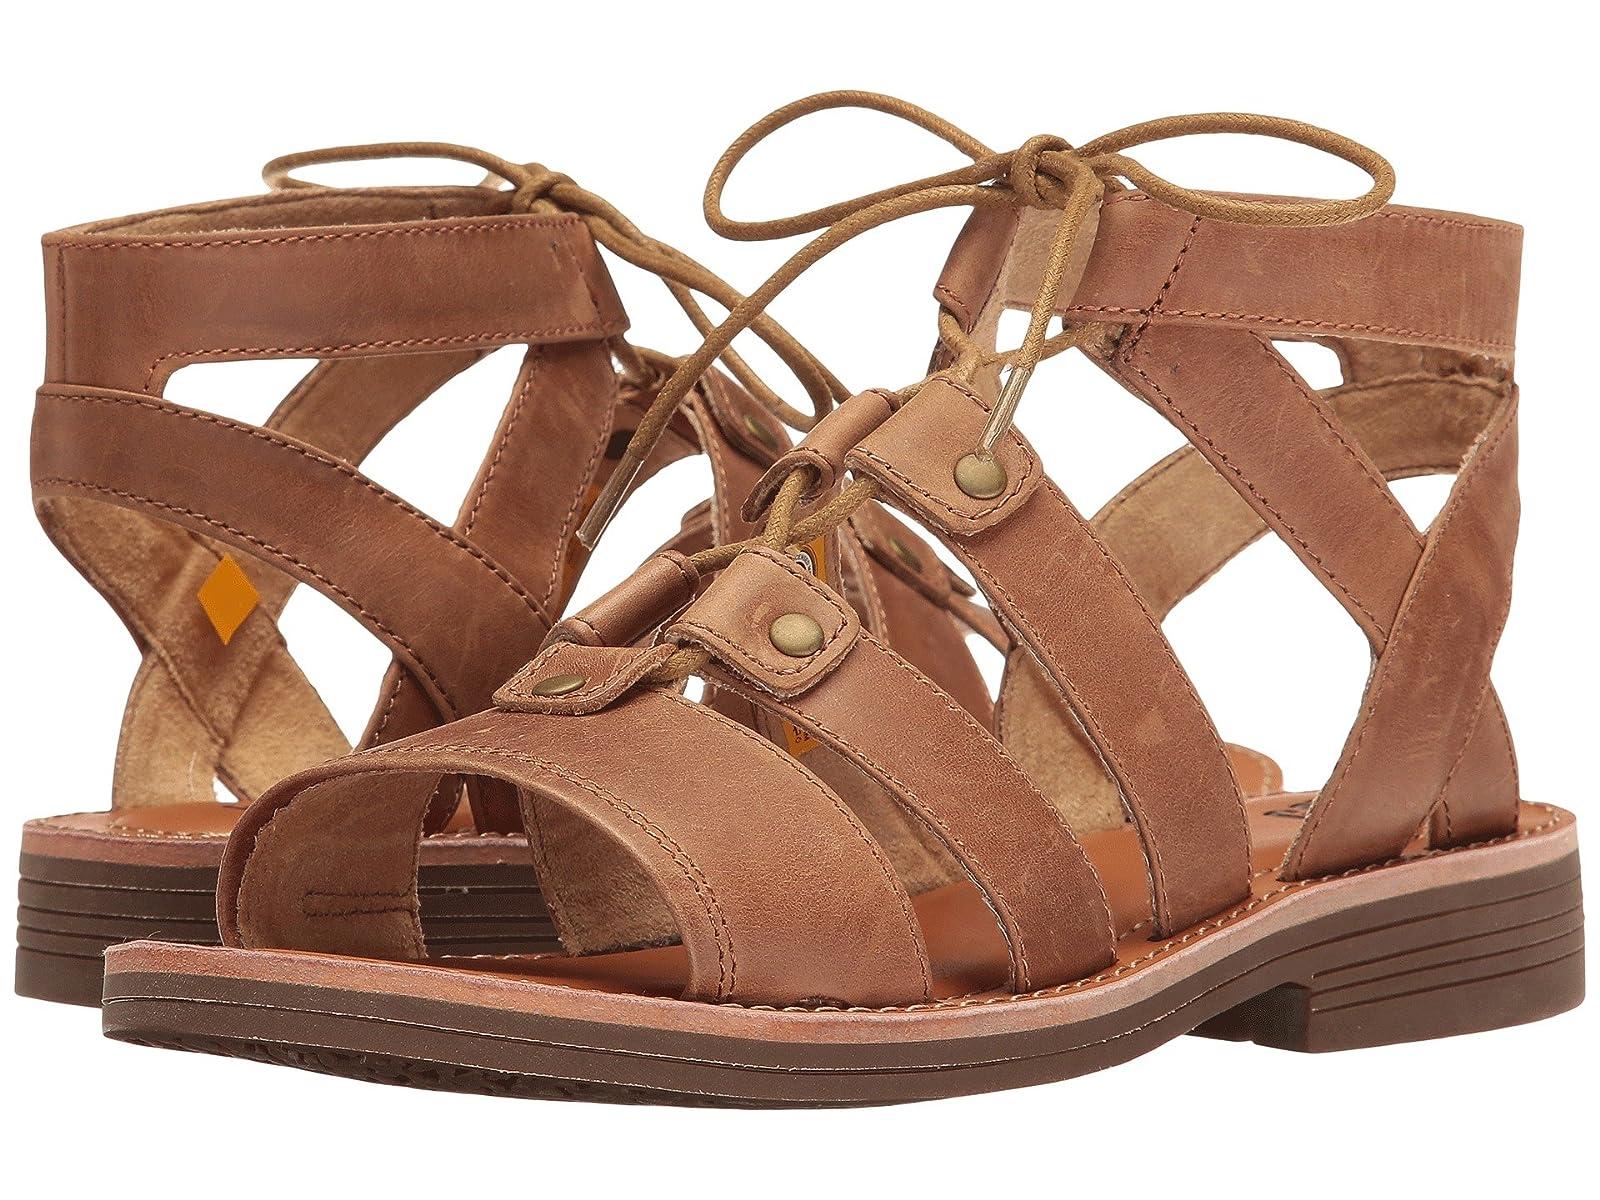 Caterpillar Casual KobbiCheap and distinctive eye-catching shoes